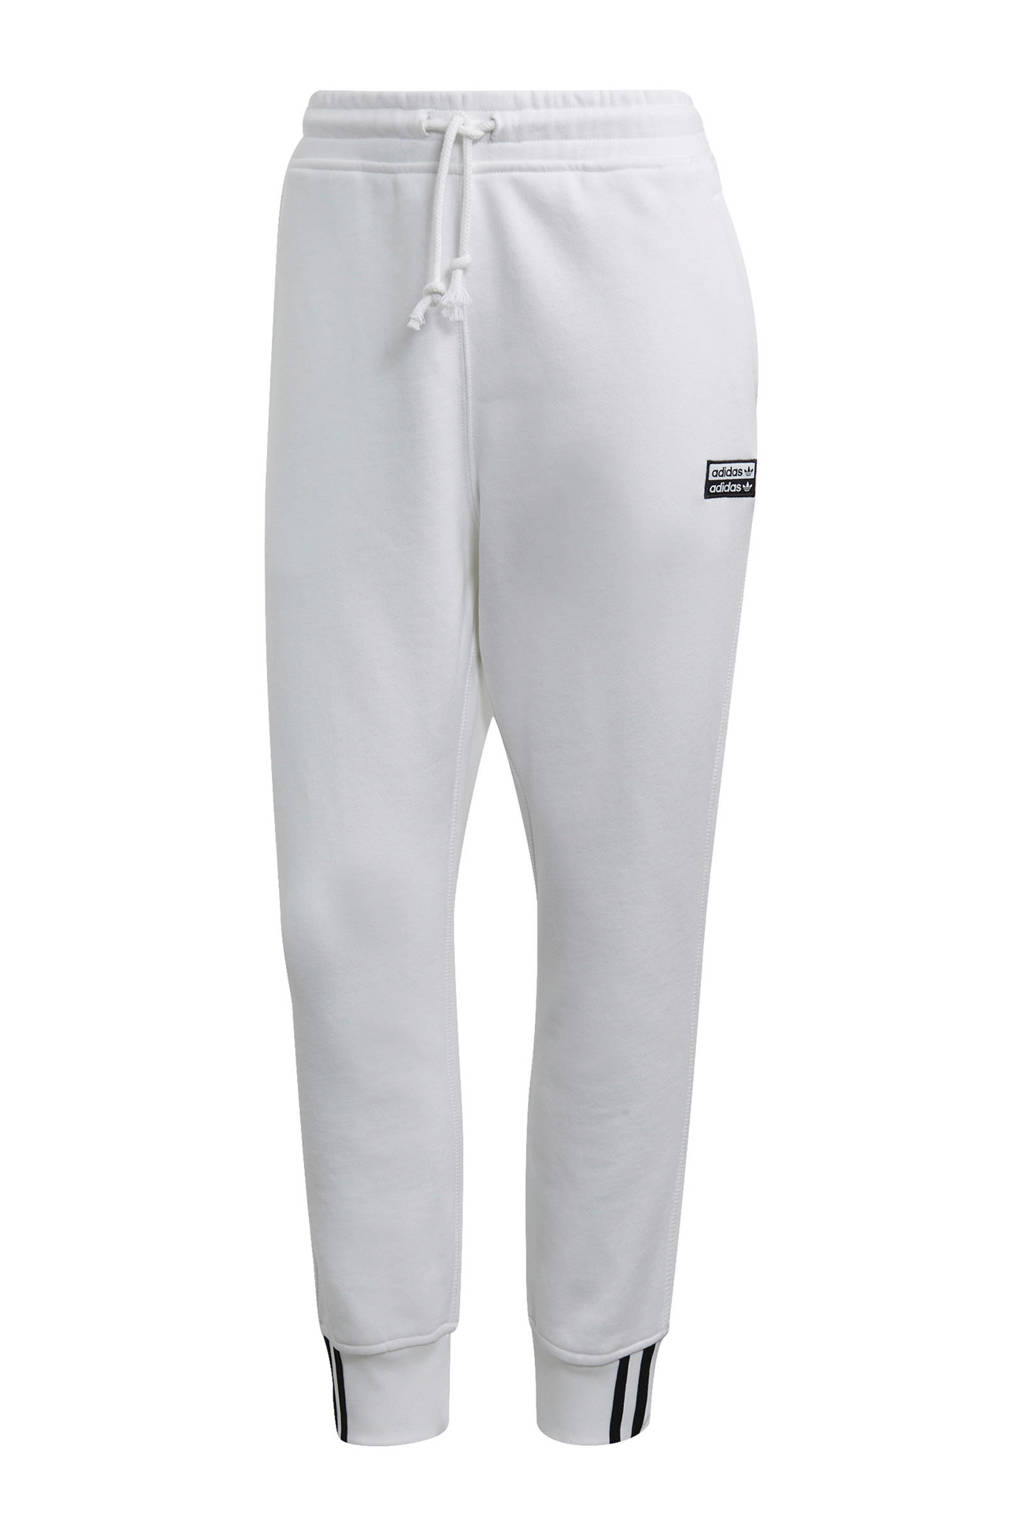 adidas originals regular fit joggingbroek wit, Wit